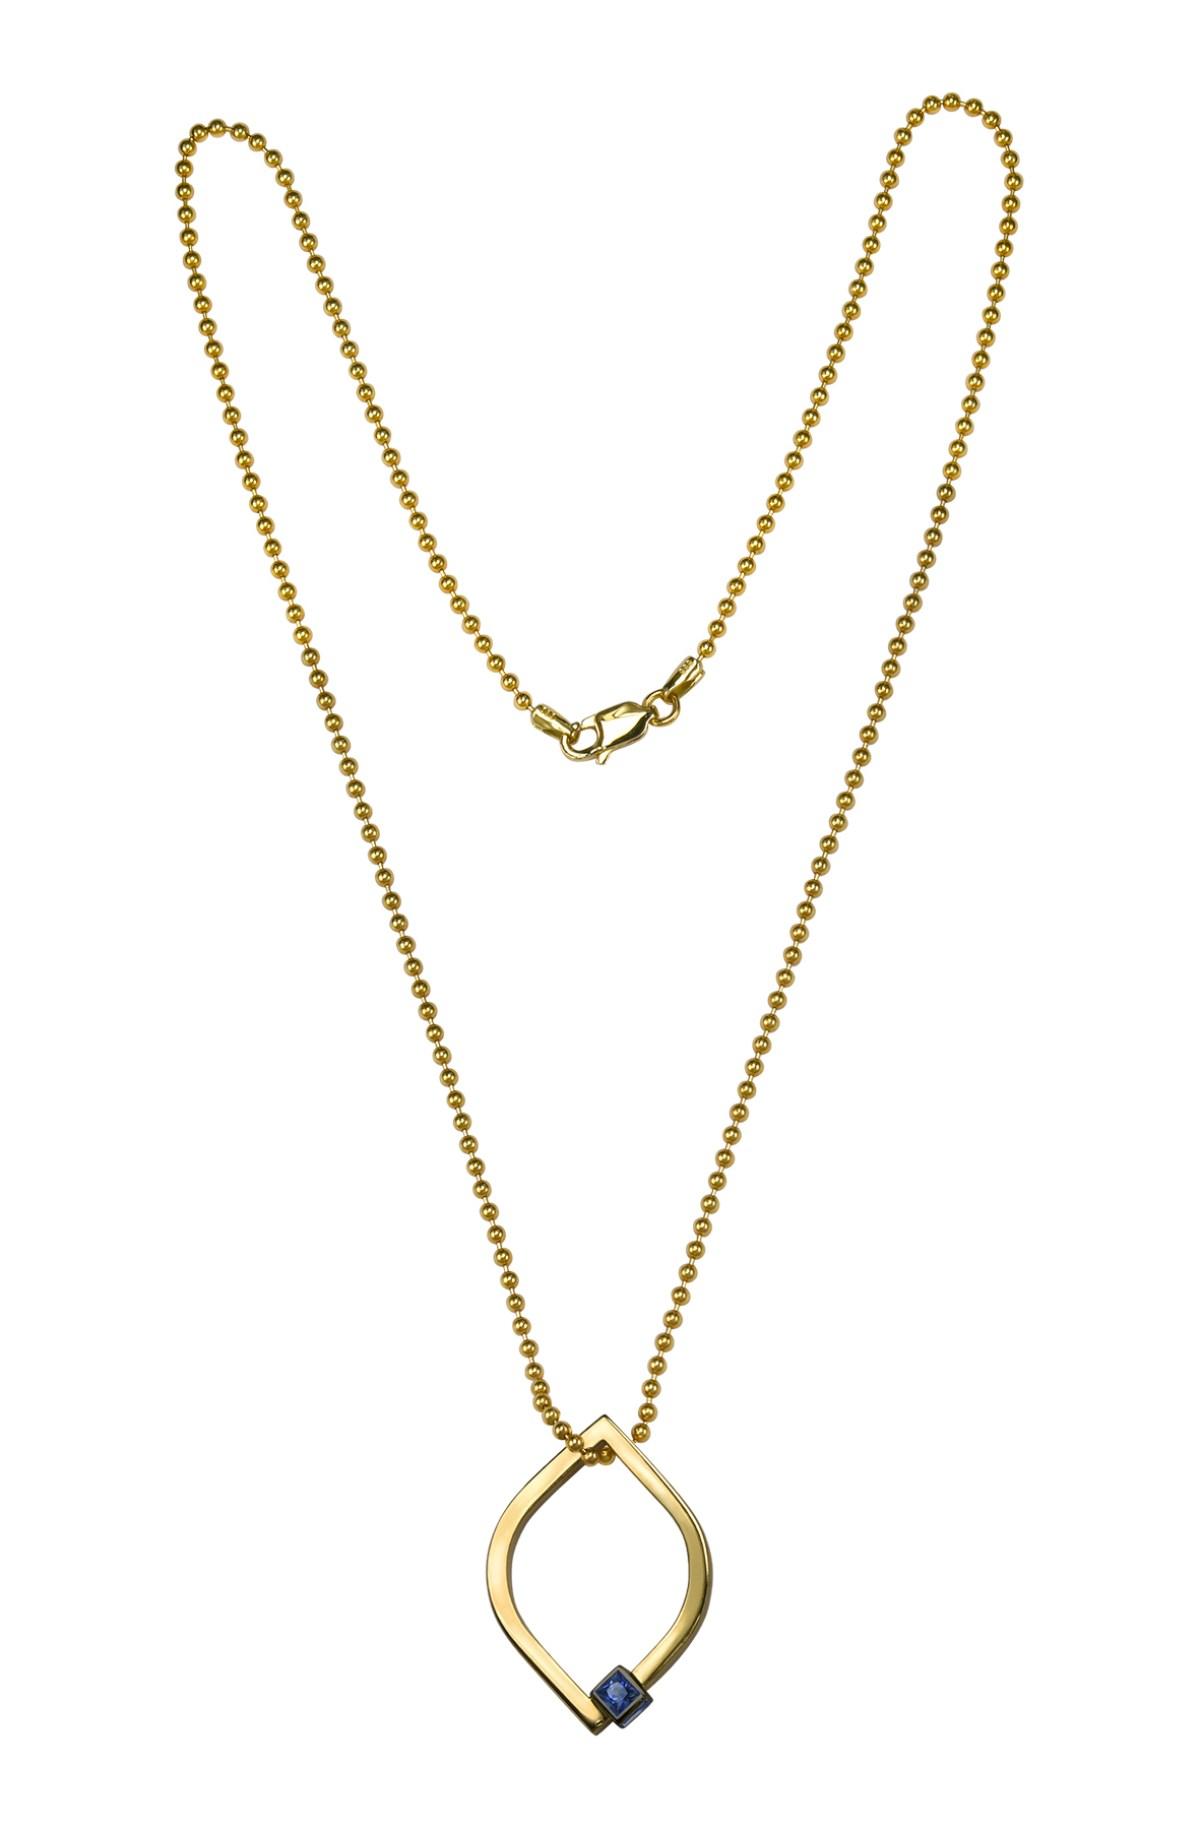 eye-ring-pendant-yellow-by-daniela-komatovic-27.600kc